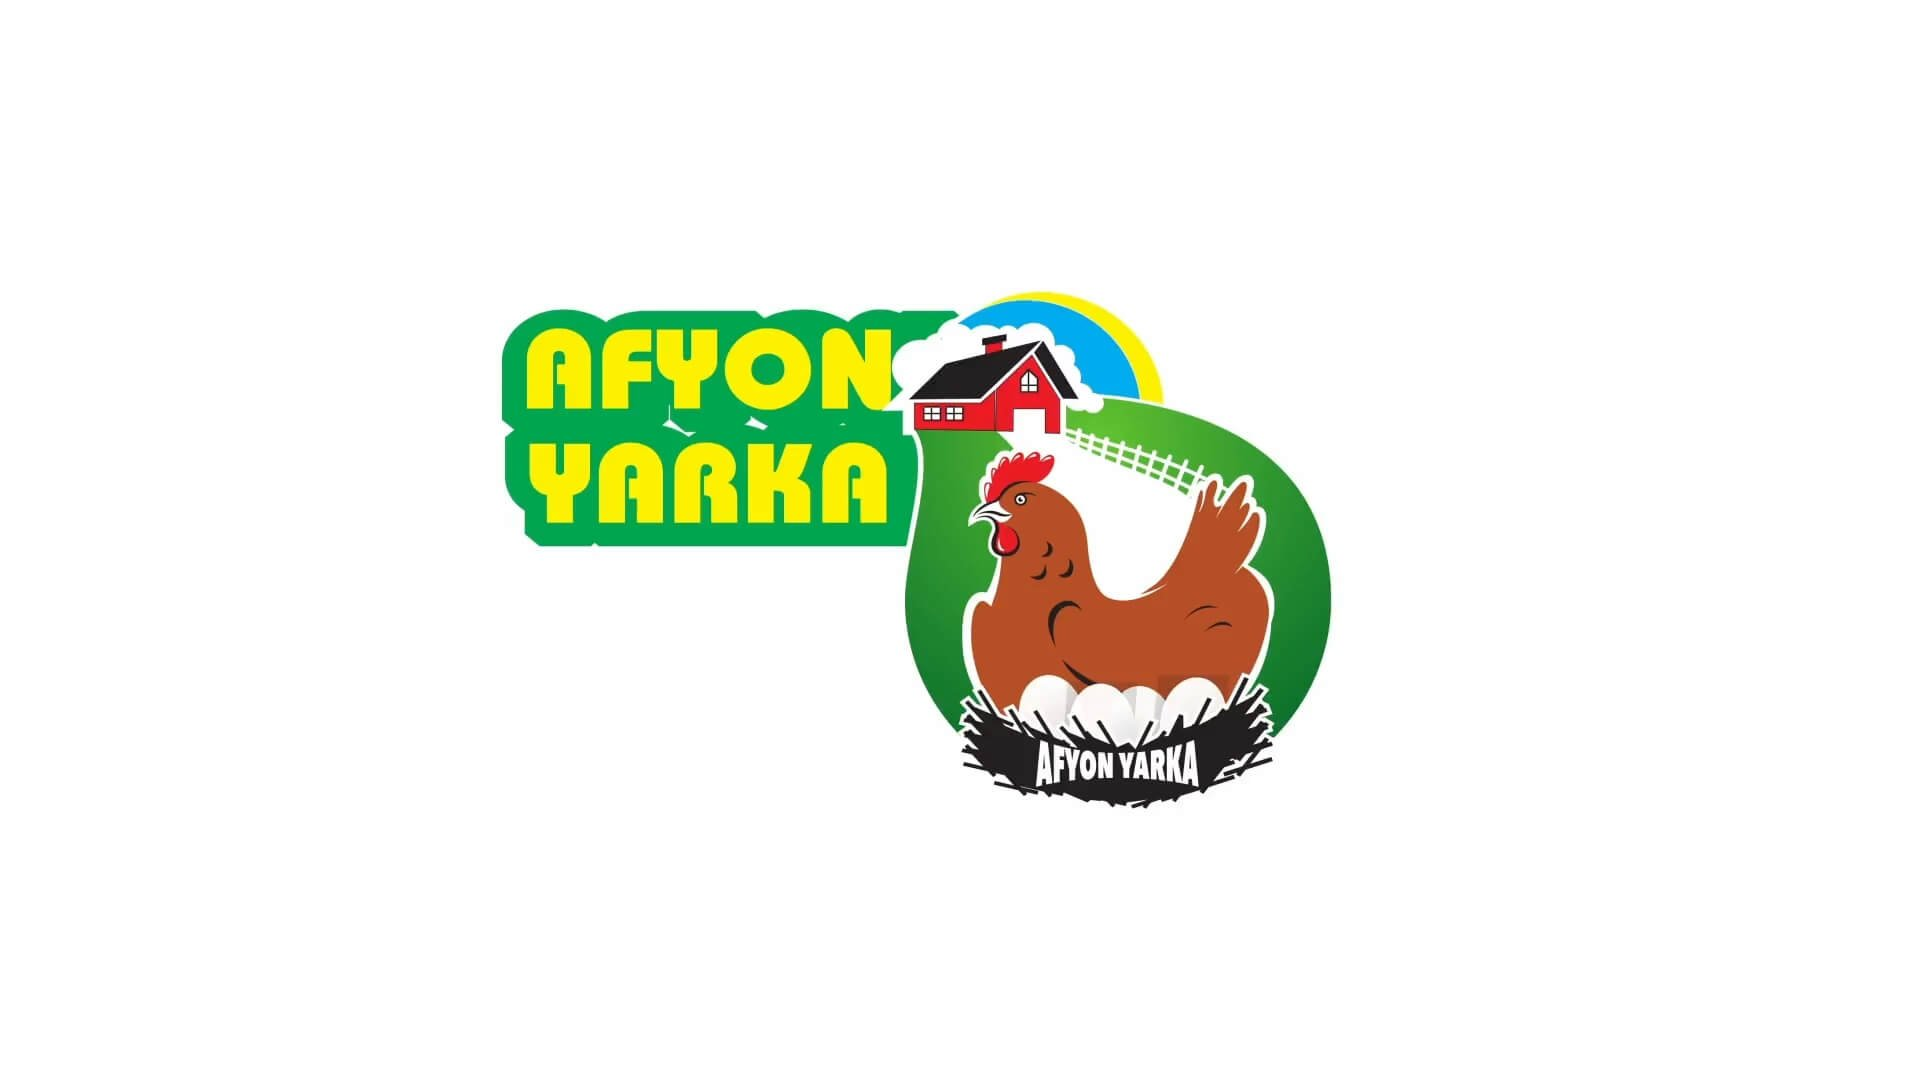 Afyon Yarka Animasyon Filmi 9 1920x1080 - Afyon Yarka Animasyon Filmi